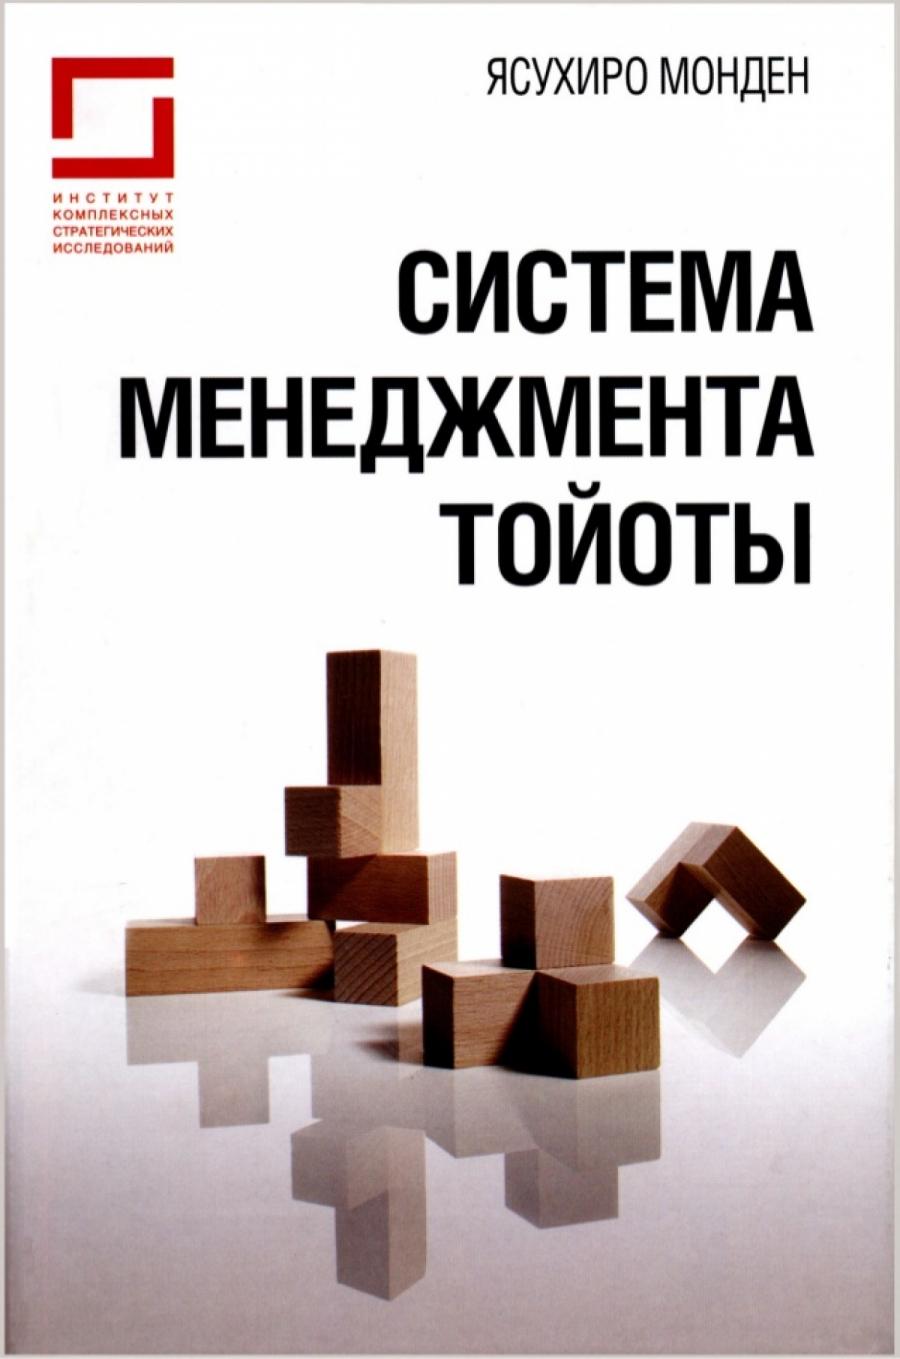 Обложка книги:  ясухиро монден - система менеджмента тойоты.